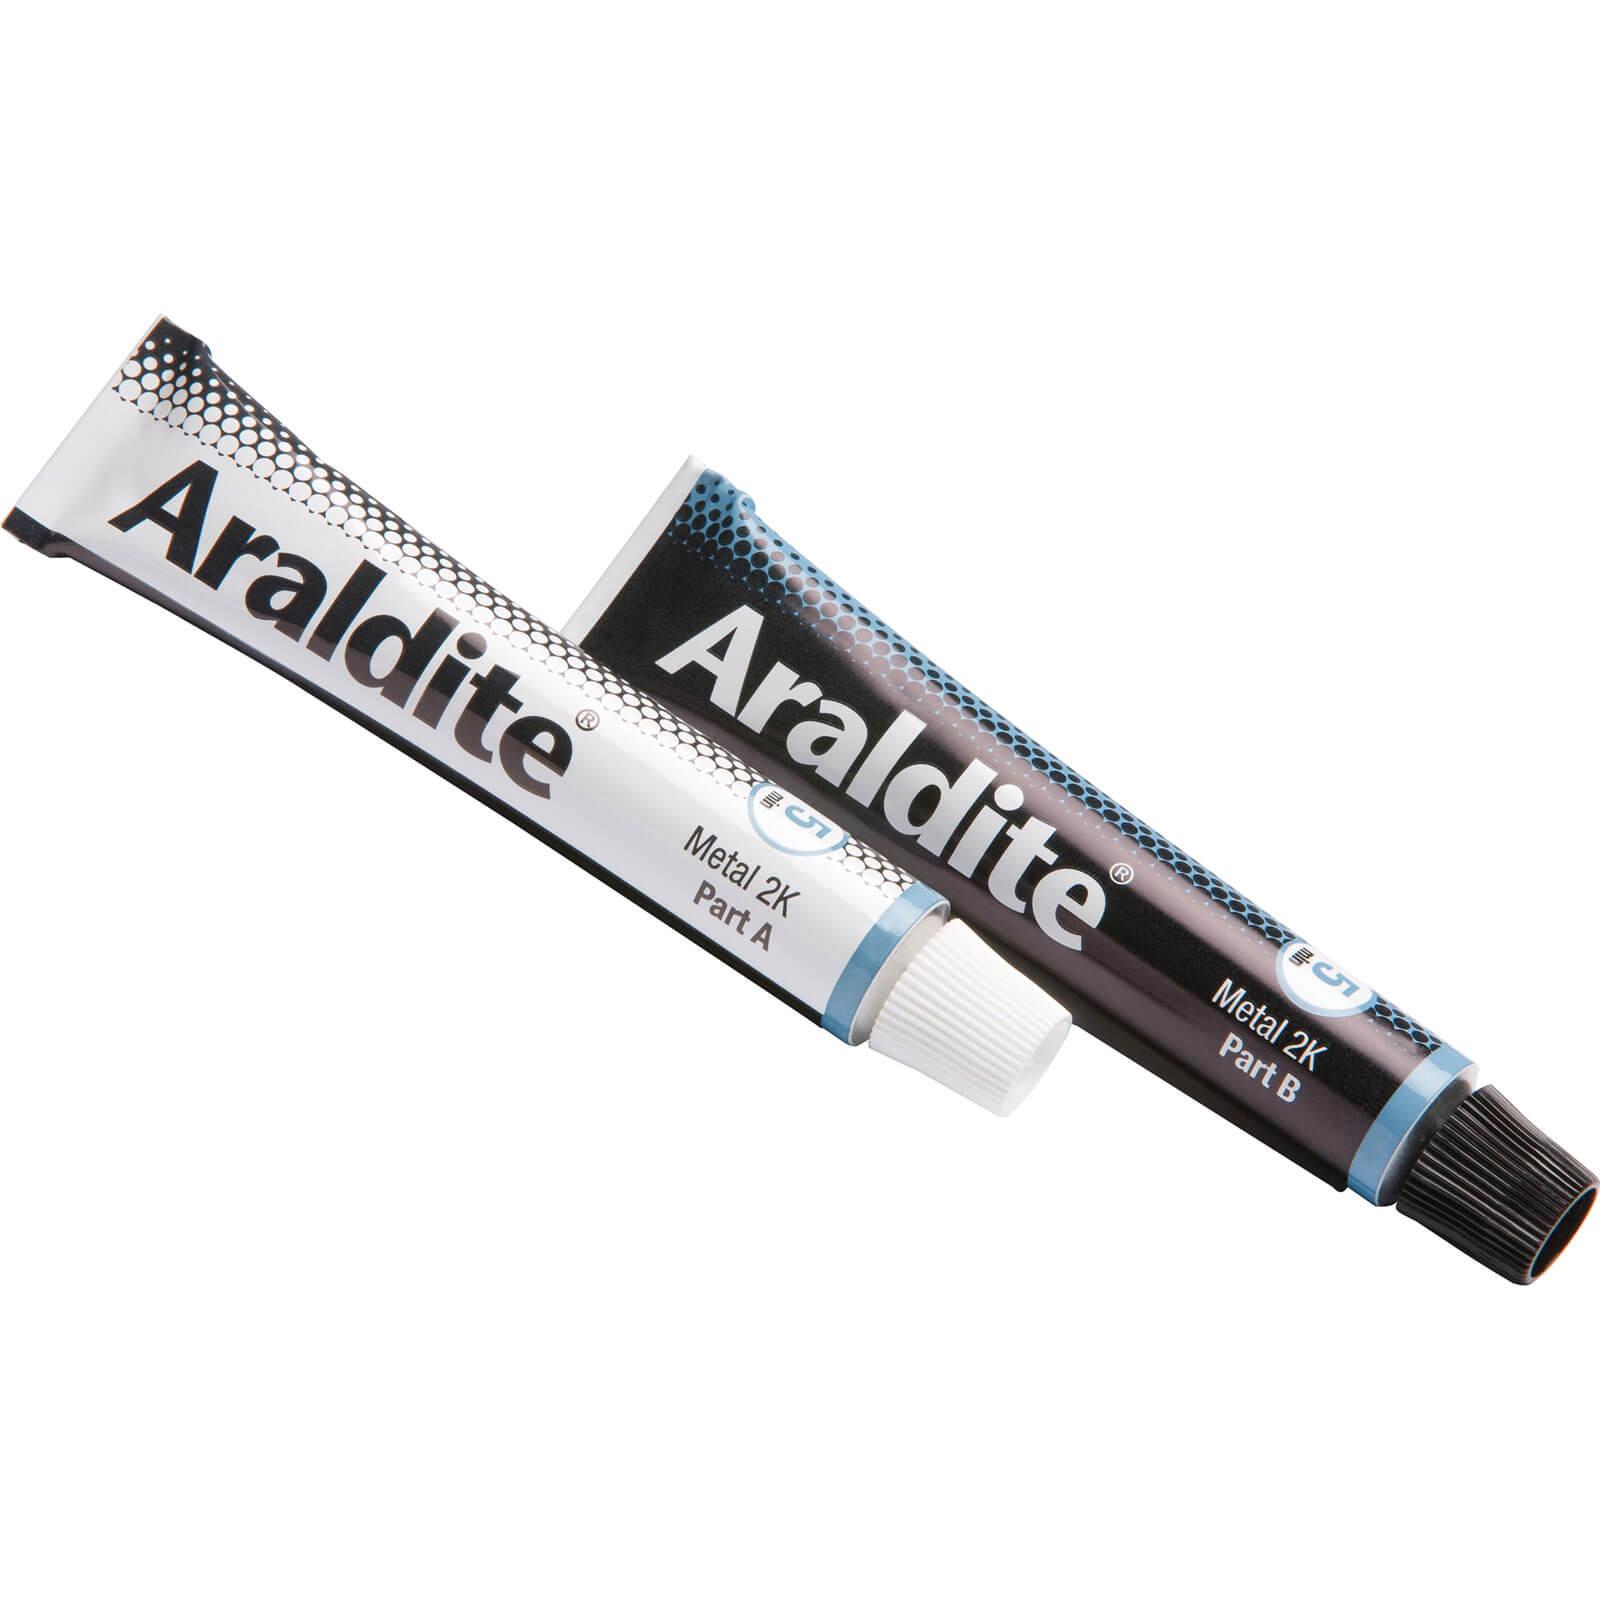 Araldite Steel Two Component Adhesive